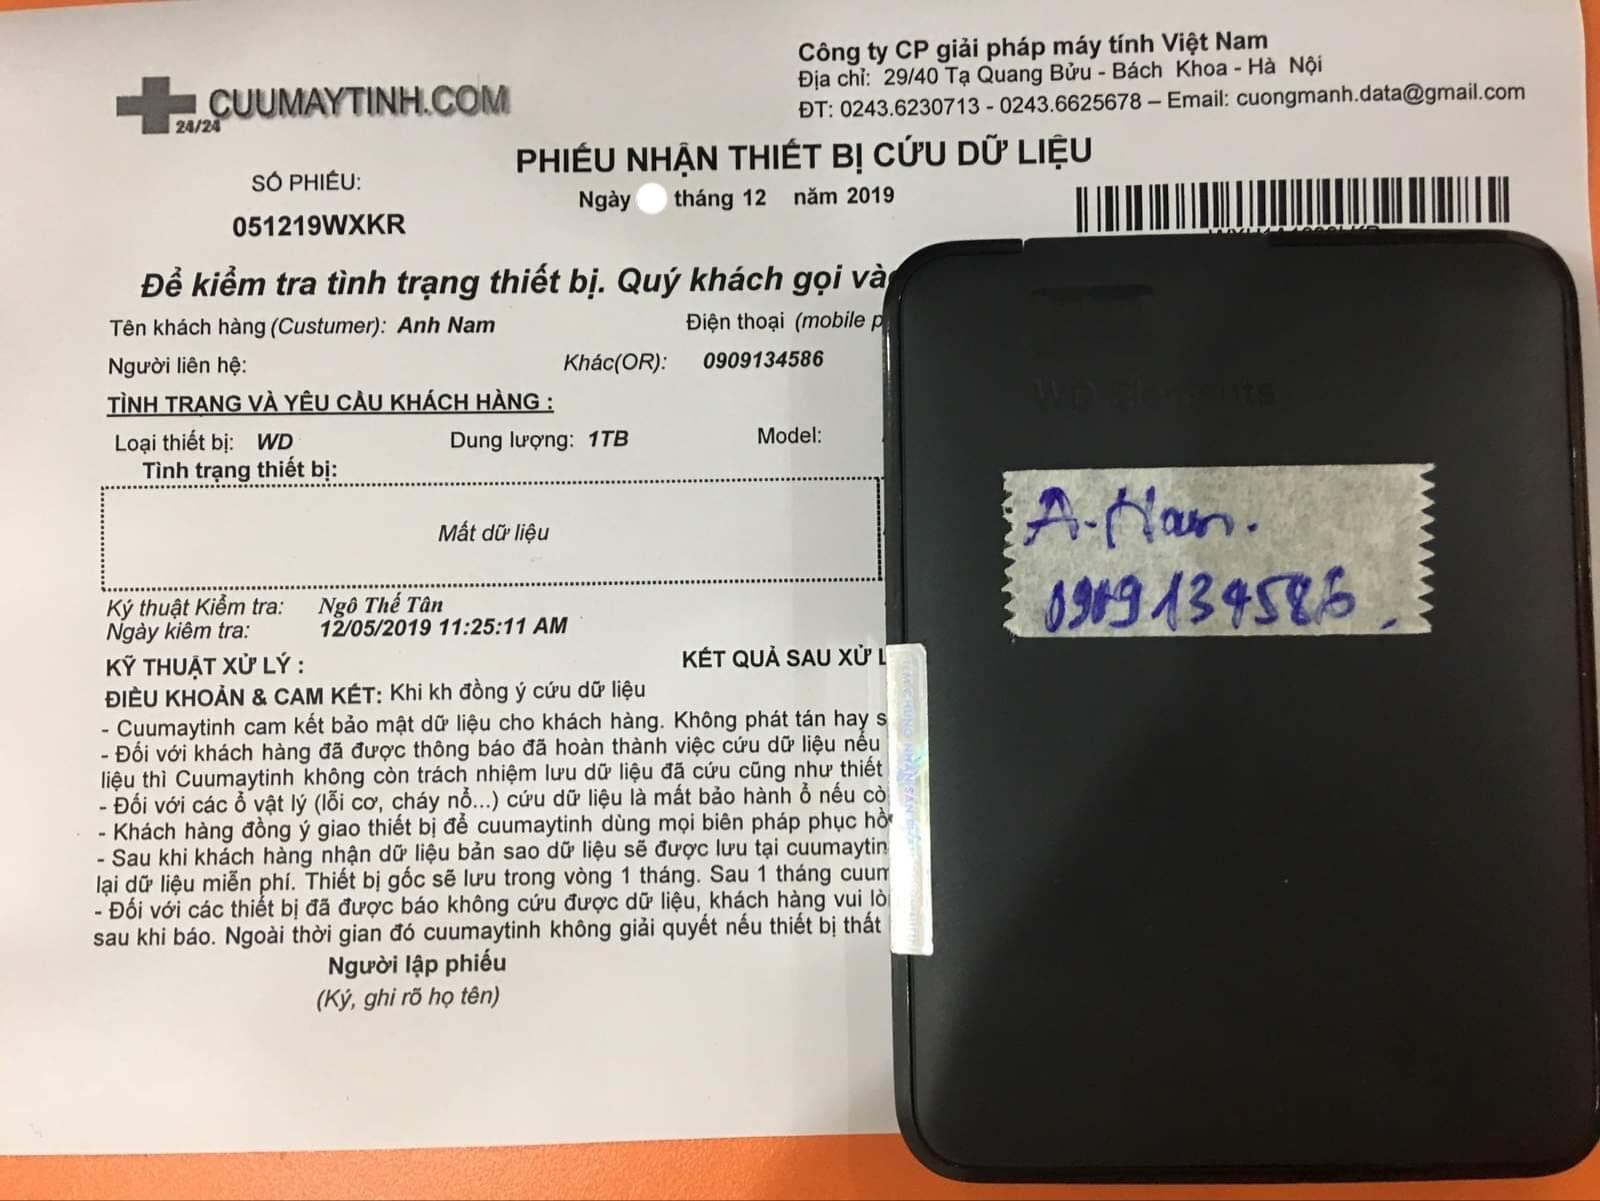 Khôi phục dữ liệu ổ cứng Western 1TB mất dữ liệu 17/12/2019 - cuumaytinh